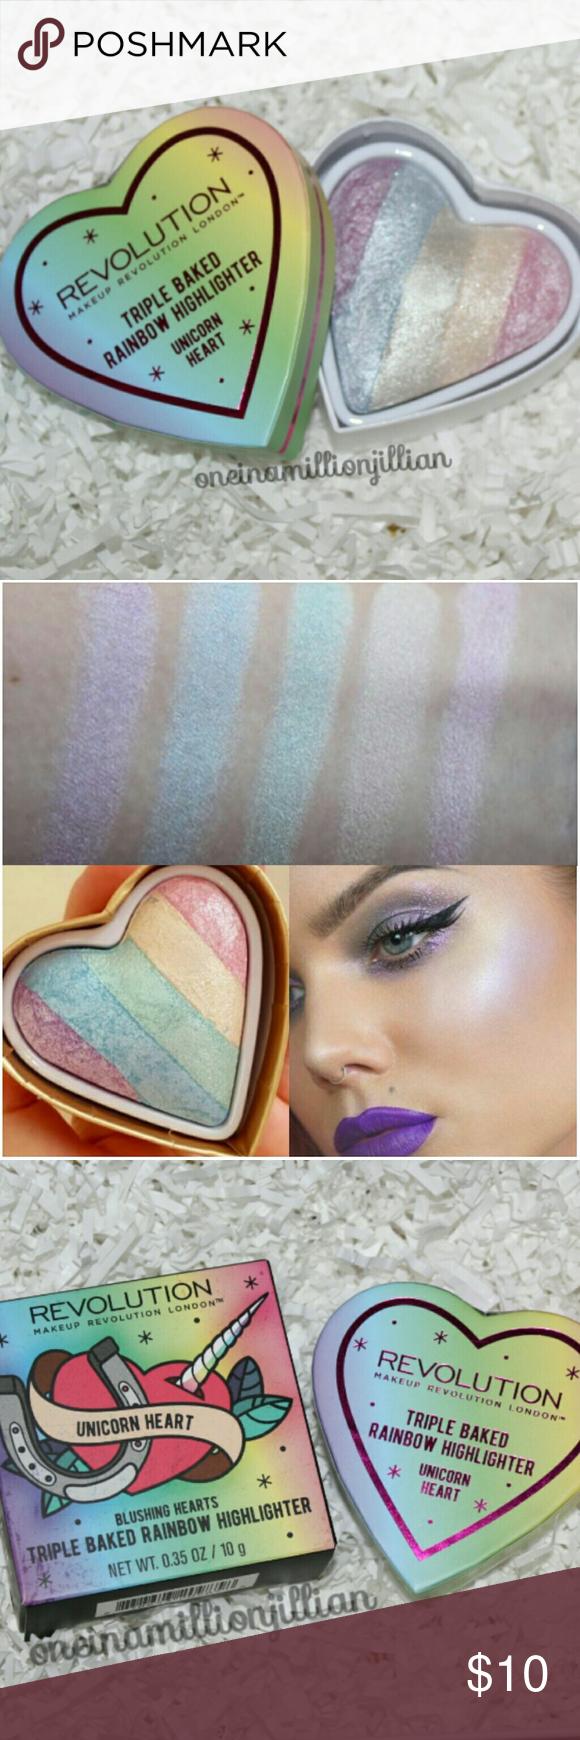 Makeup Revolution Rainbow Highlighting Powder New in Box